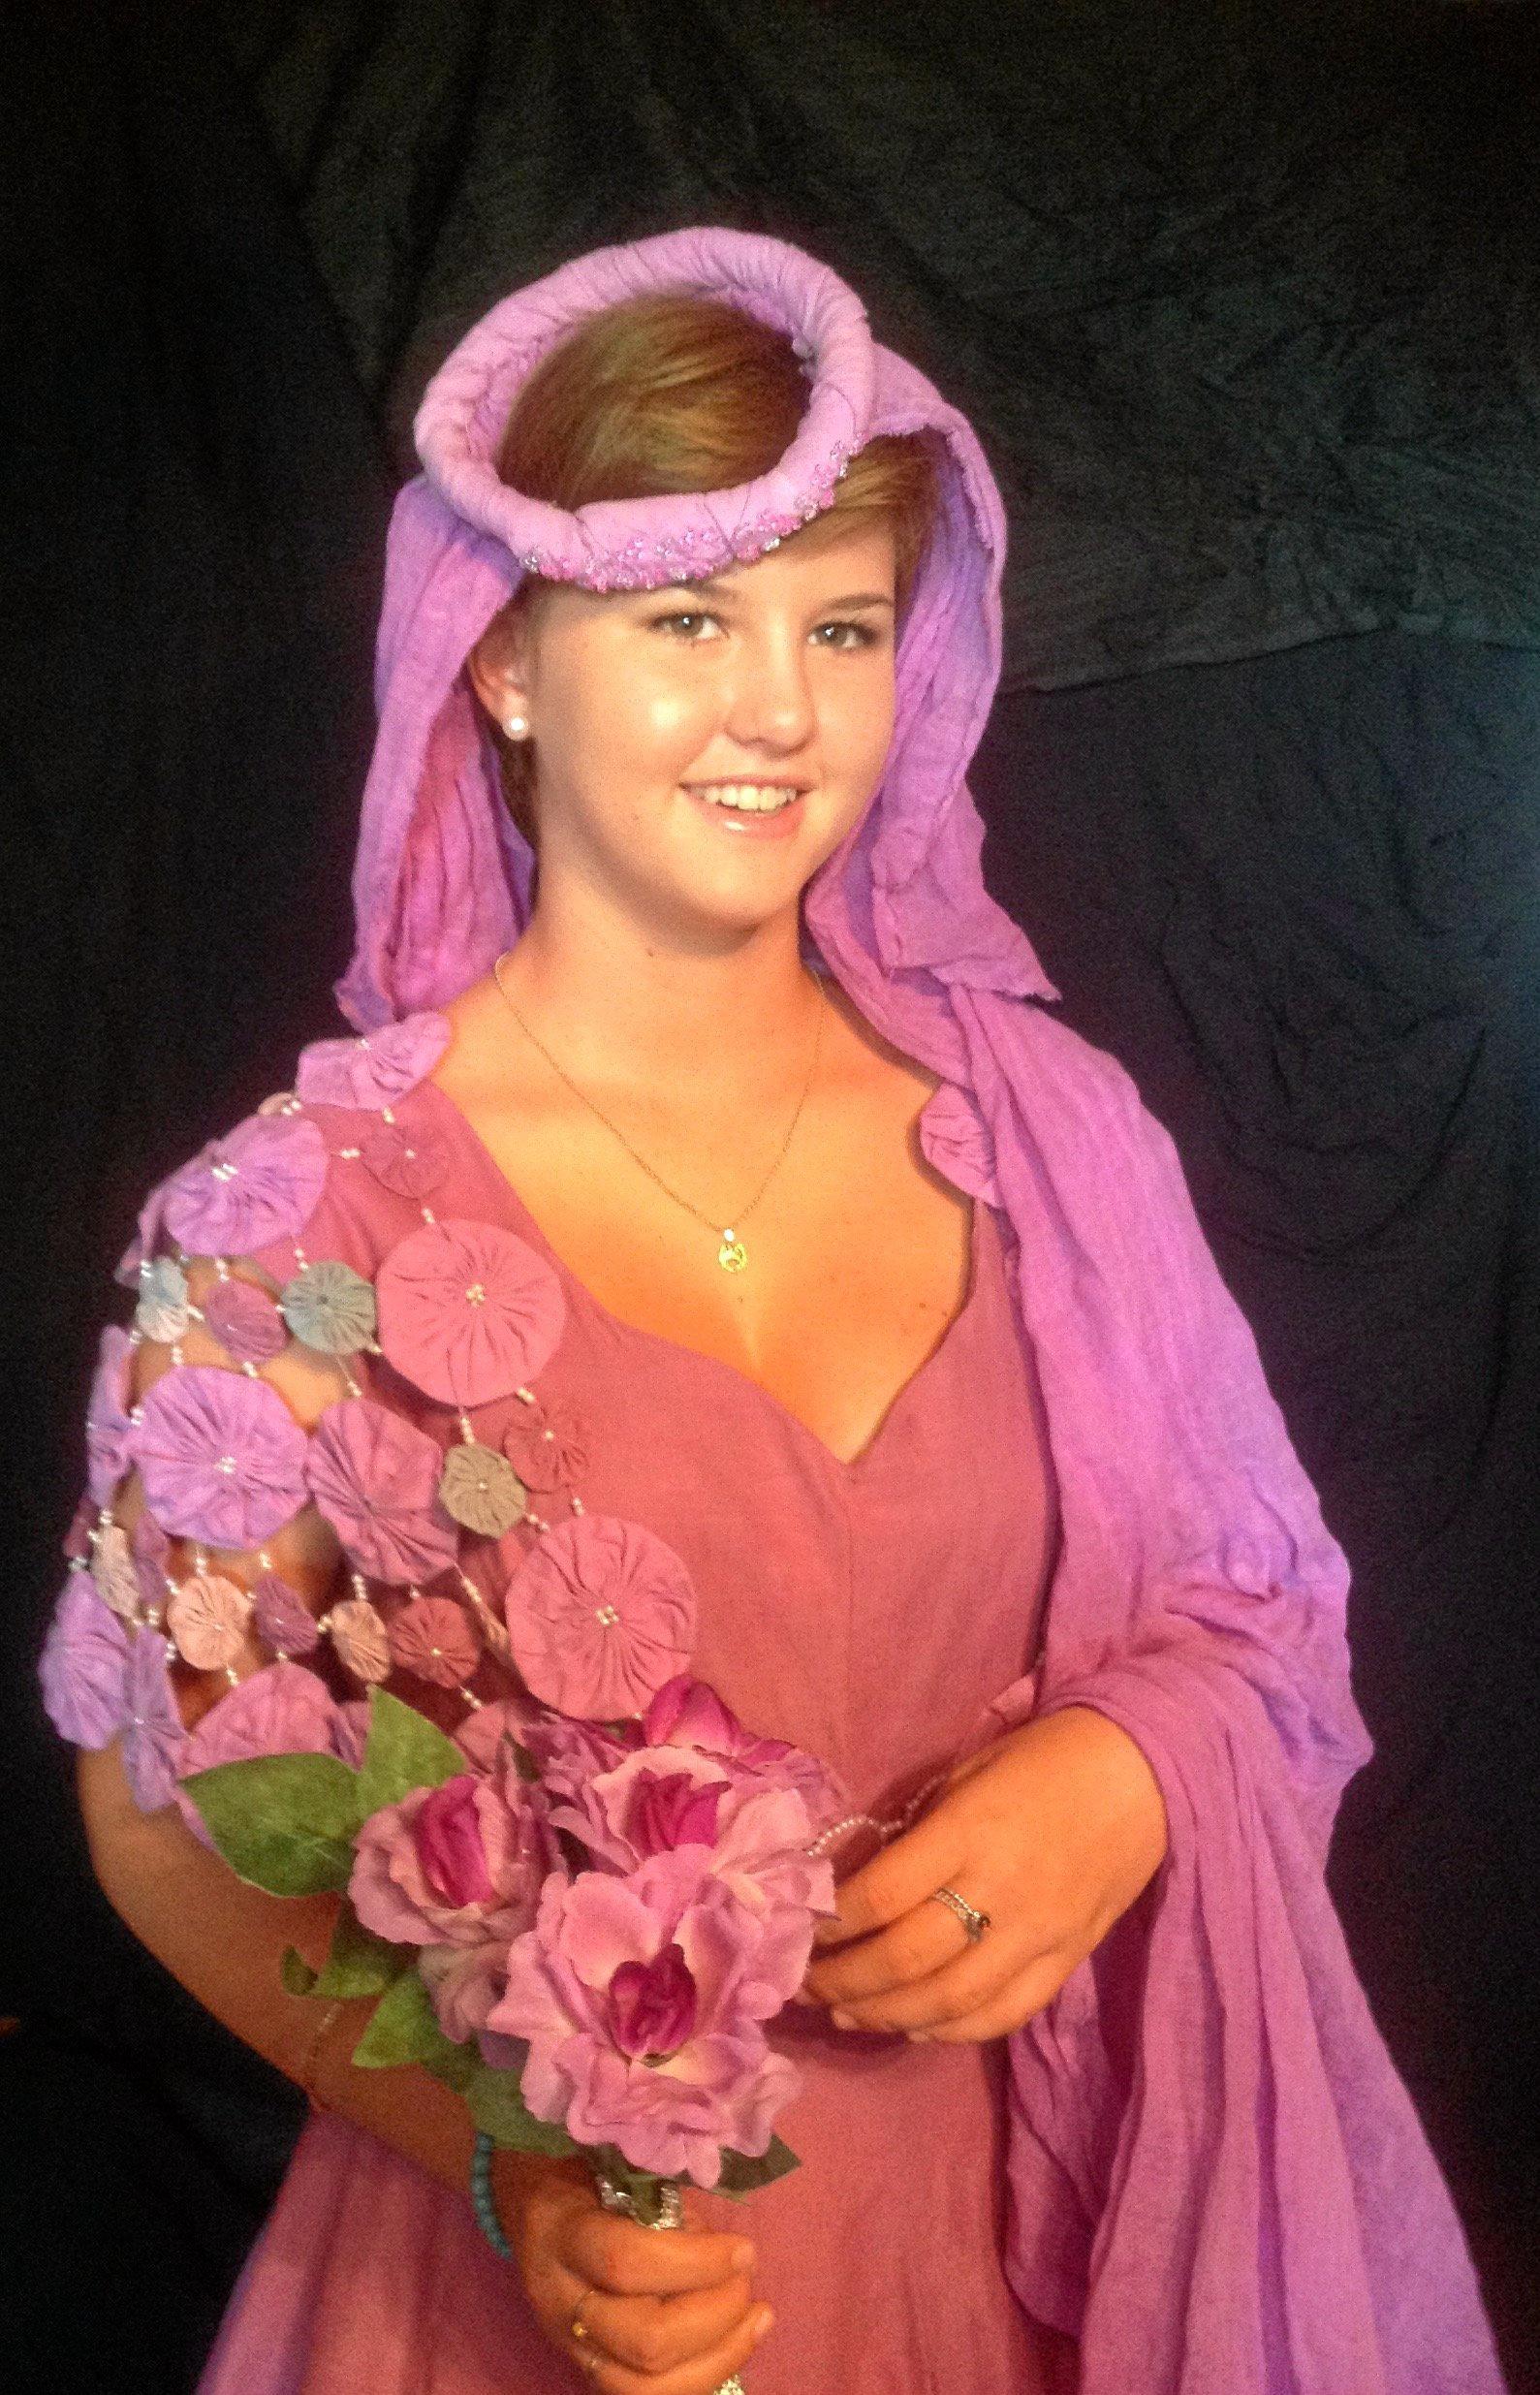 Samantha Gillespie in one of Lyn Gordon's wearable art works, a Venetian violet wedding dress.